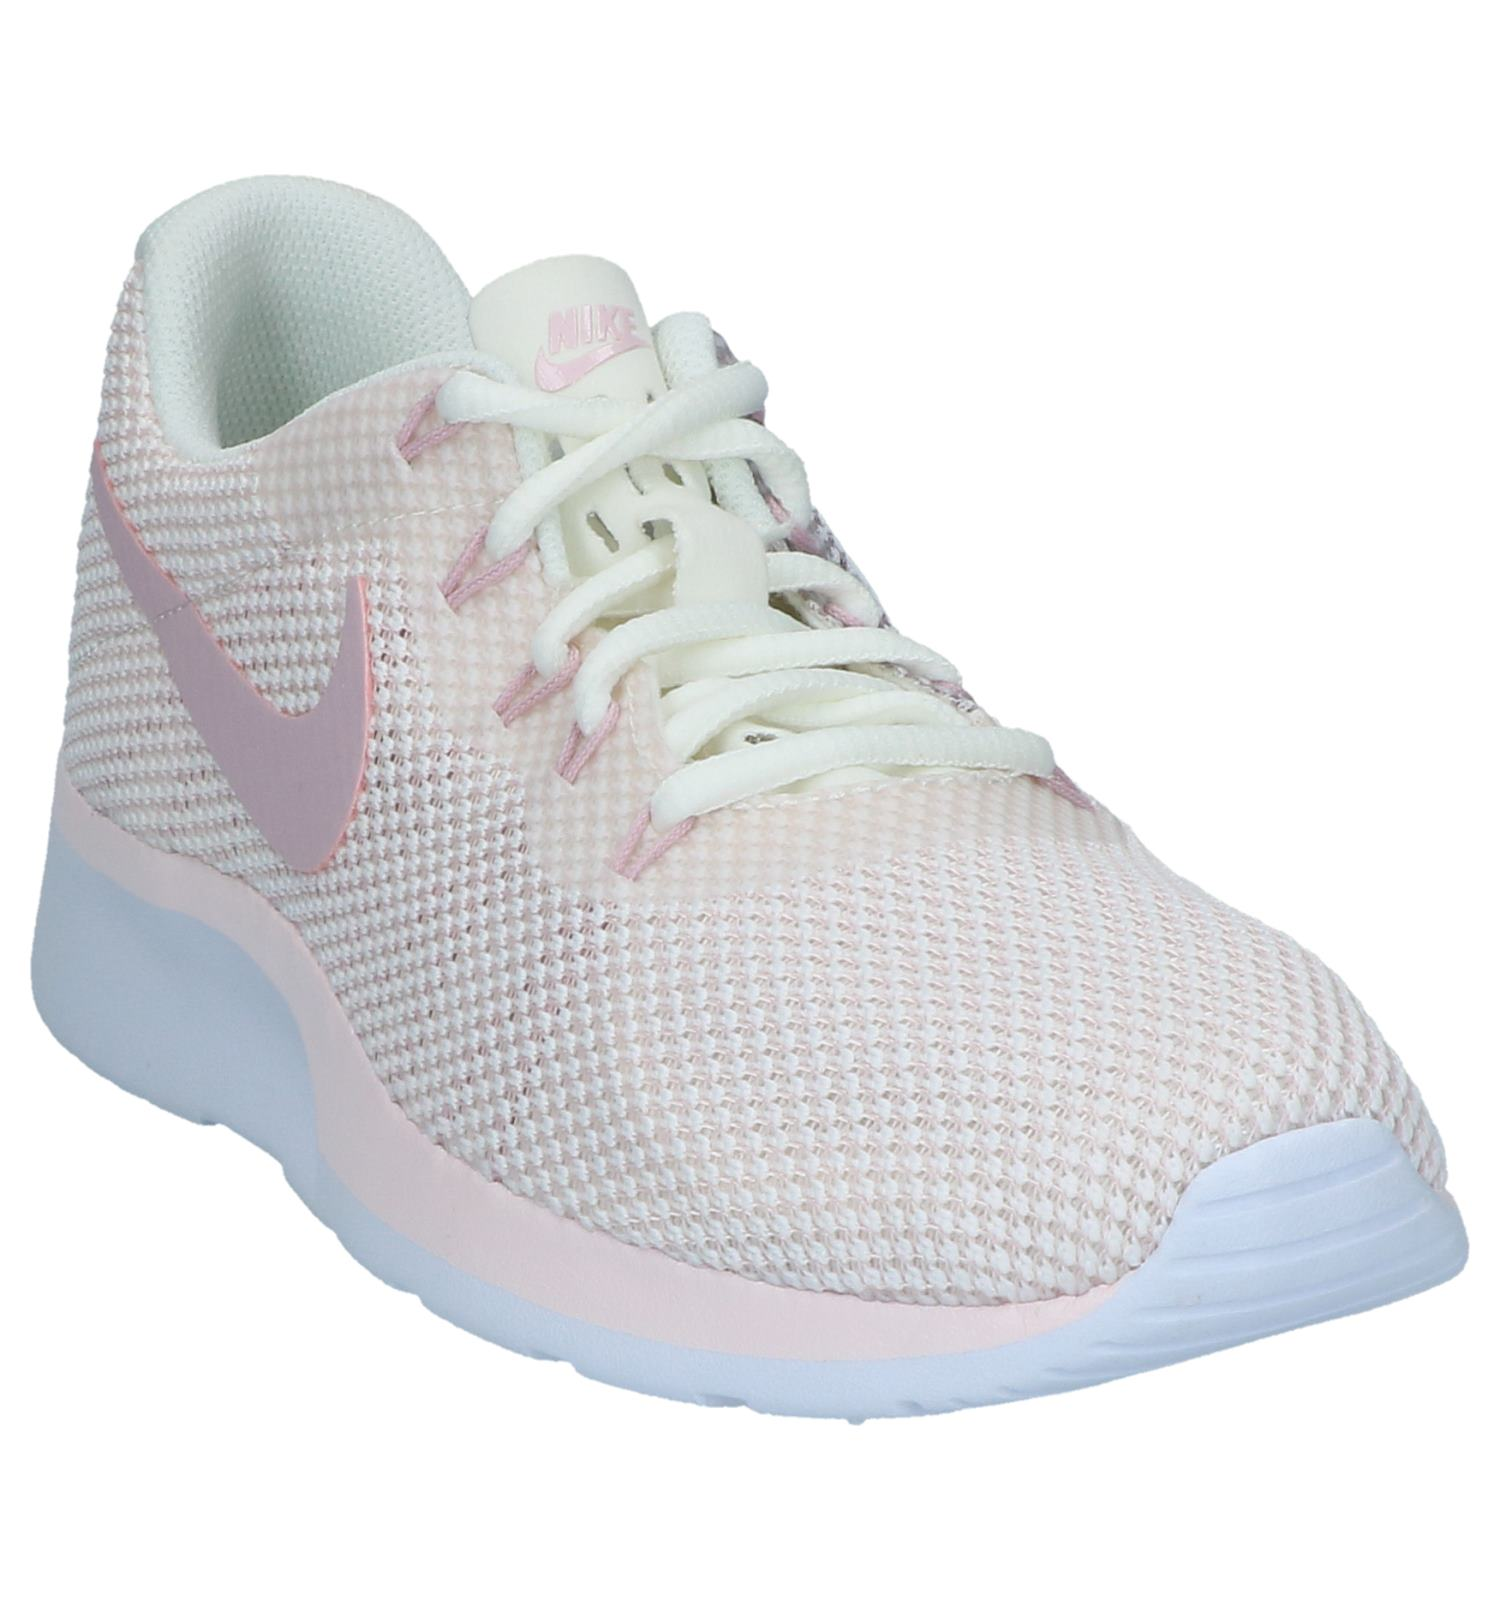 de7aee27c19 Roze Runners Nike Tanjun Racer | TORFS.BE | Gratis verzend en retour